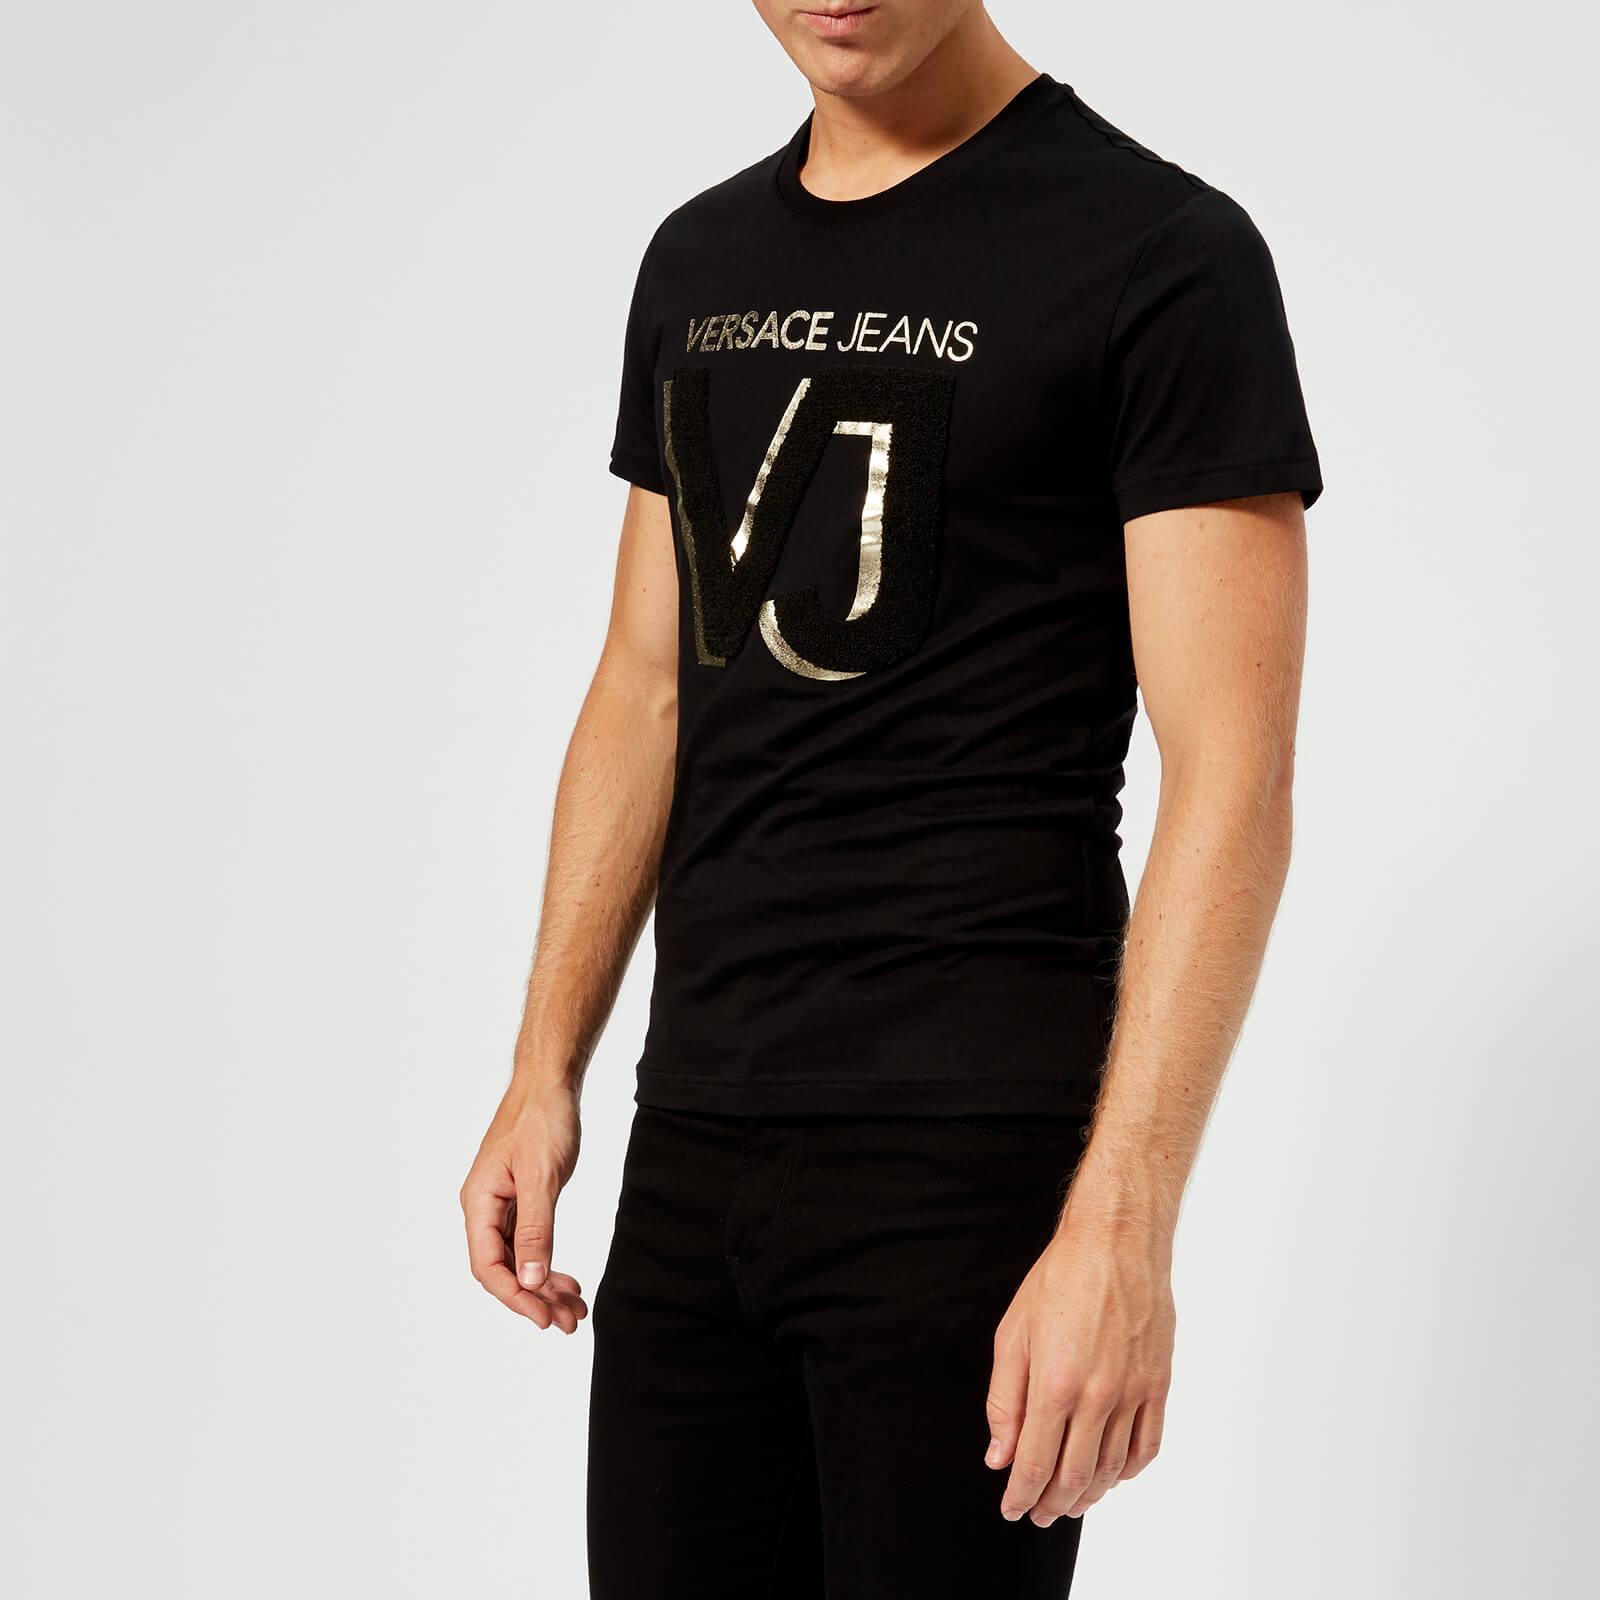 fcf33f9cd4f Versace Jeans Men s VJ Chest Logo T-Shirt - Black Clothing